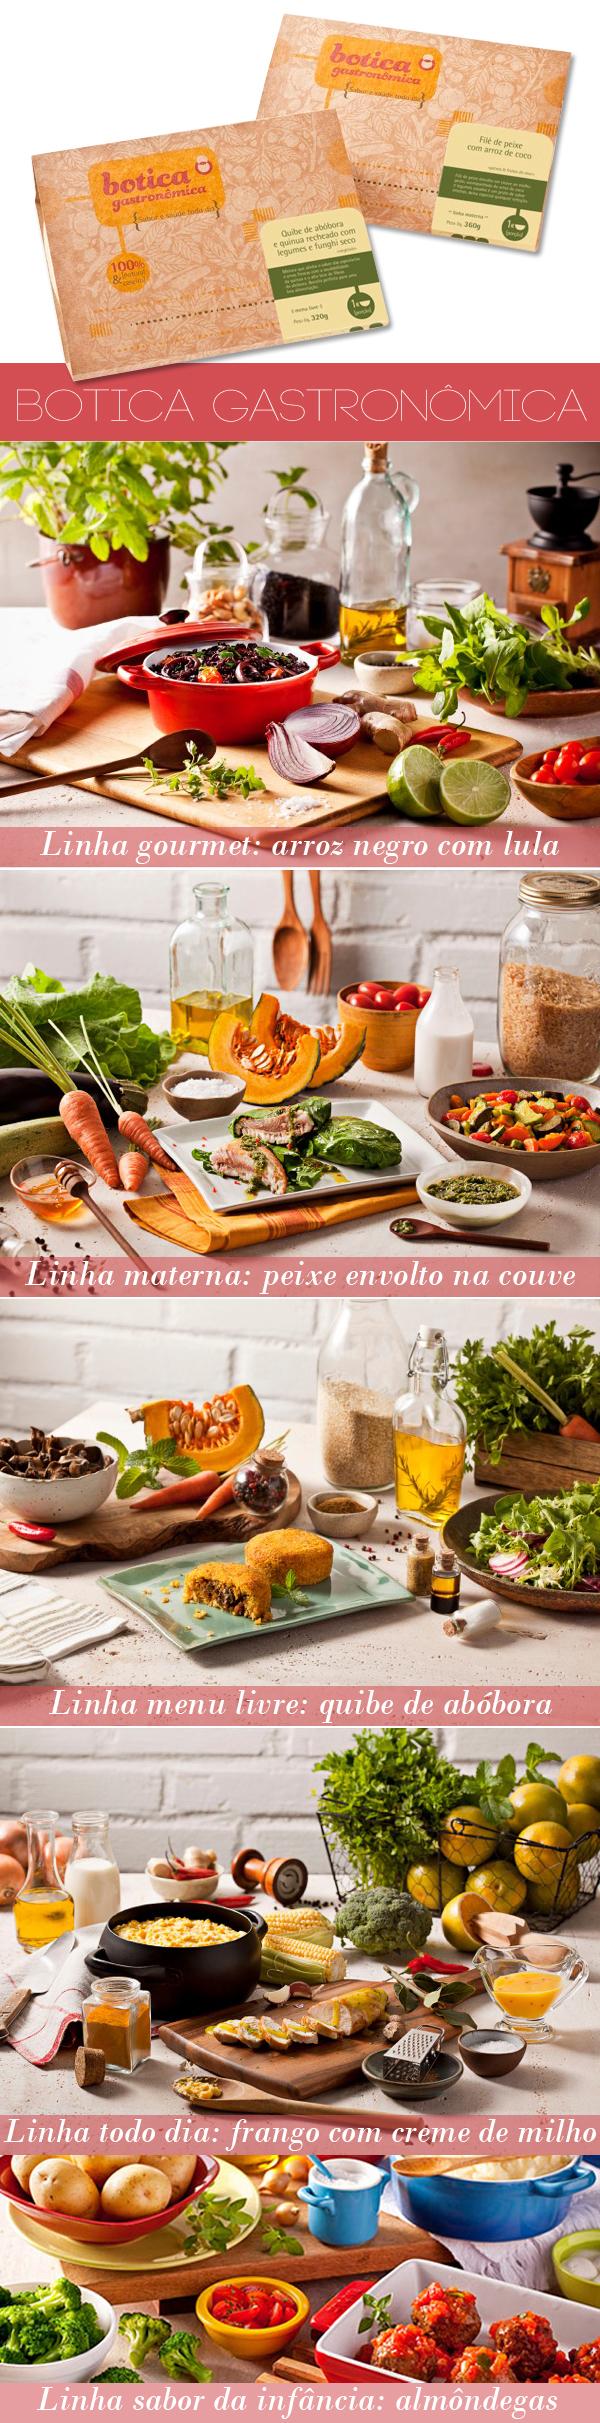 botica gastronomica